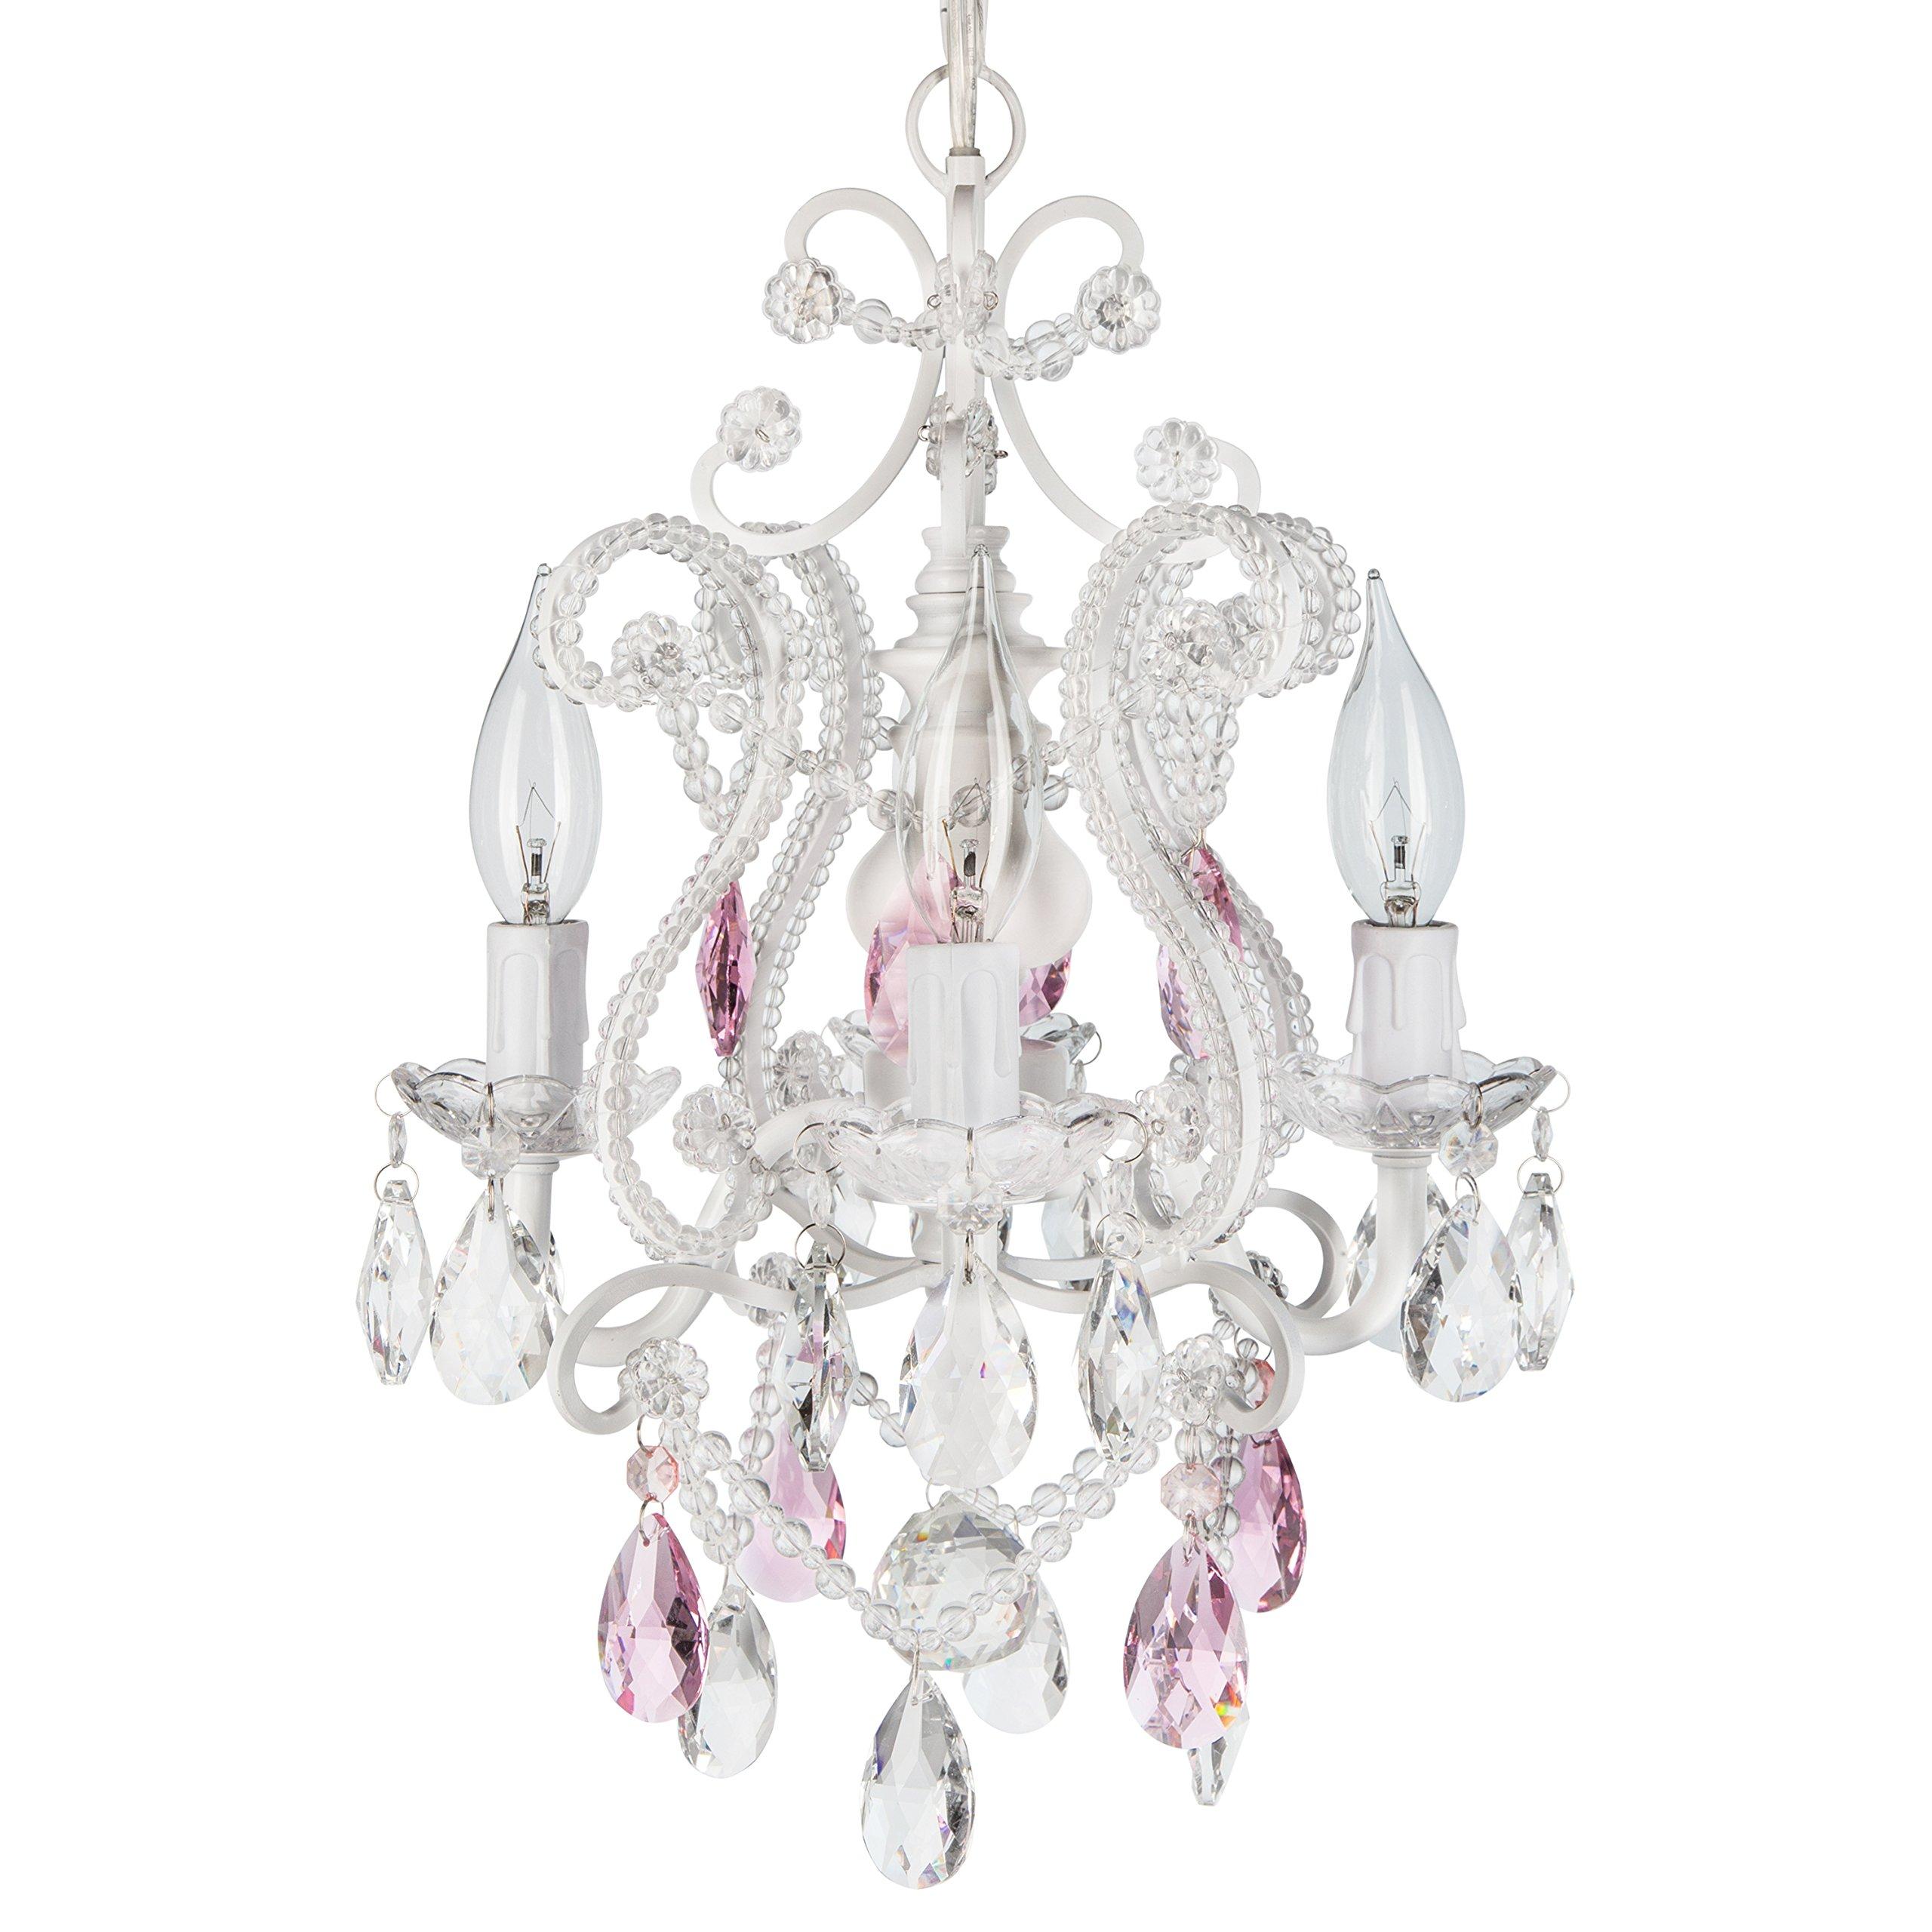 Josephine Pink Crystal Beaded White Chandelier, Mini Nursery Plug-In Glass Pendant 4 Light Wrought Iron Swag Ceiling Lighting Fixture Lamp